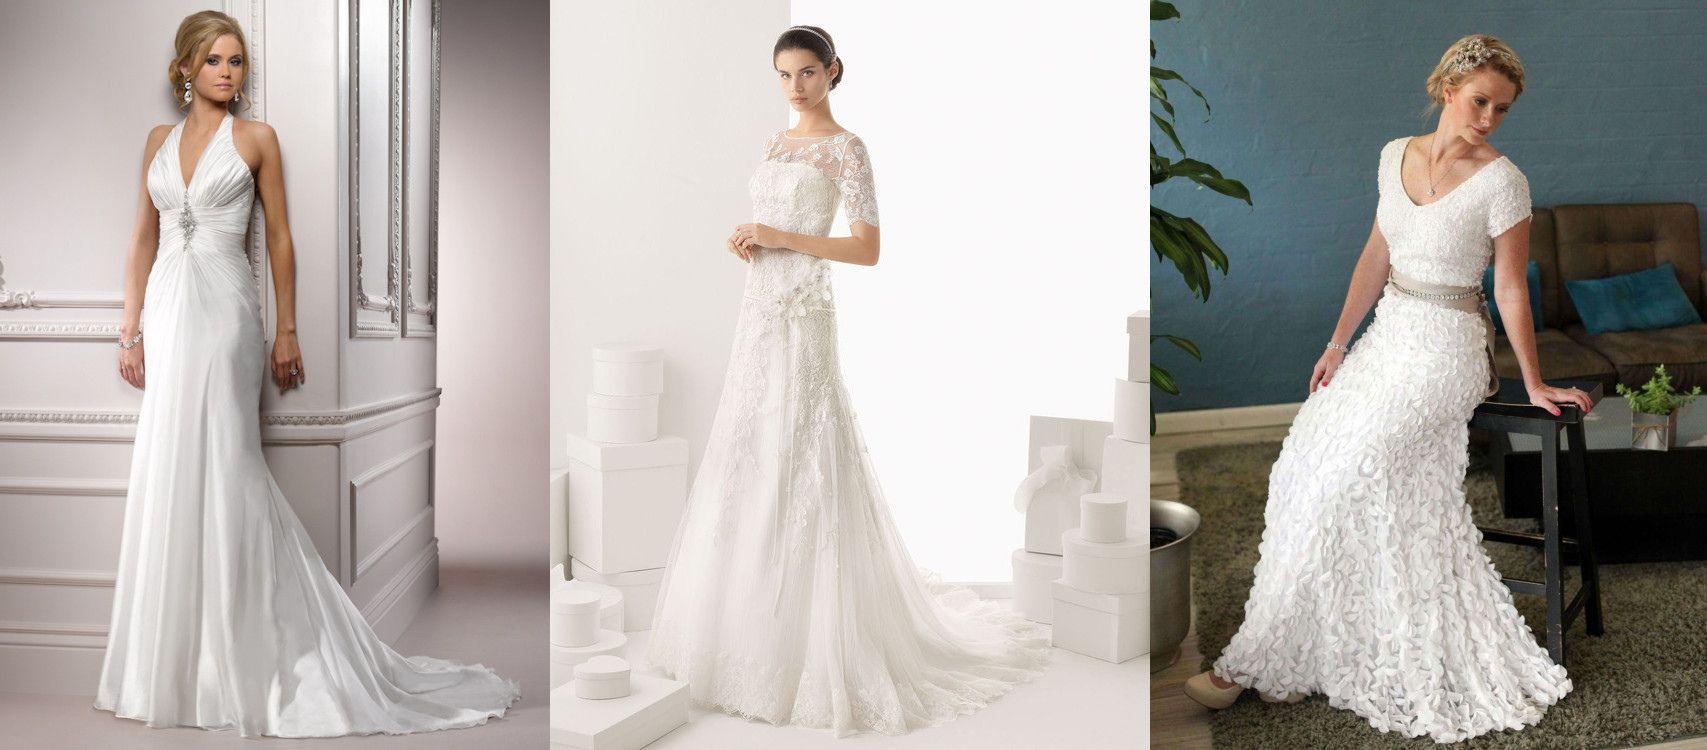 50+ Wedding Dresses for Over 50 Brides - Wedding Dresses for the ...